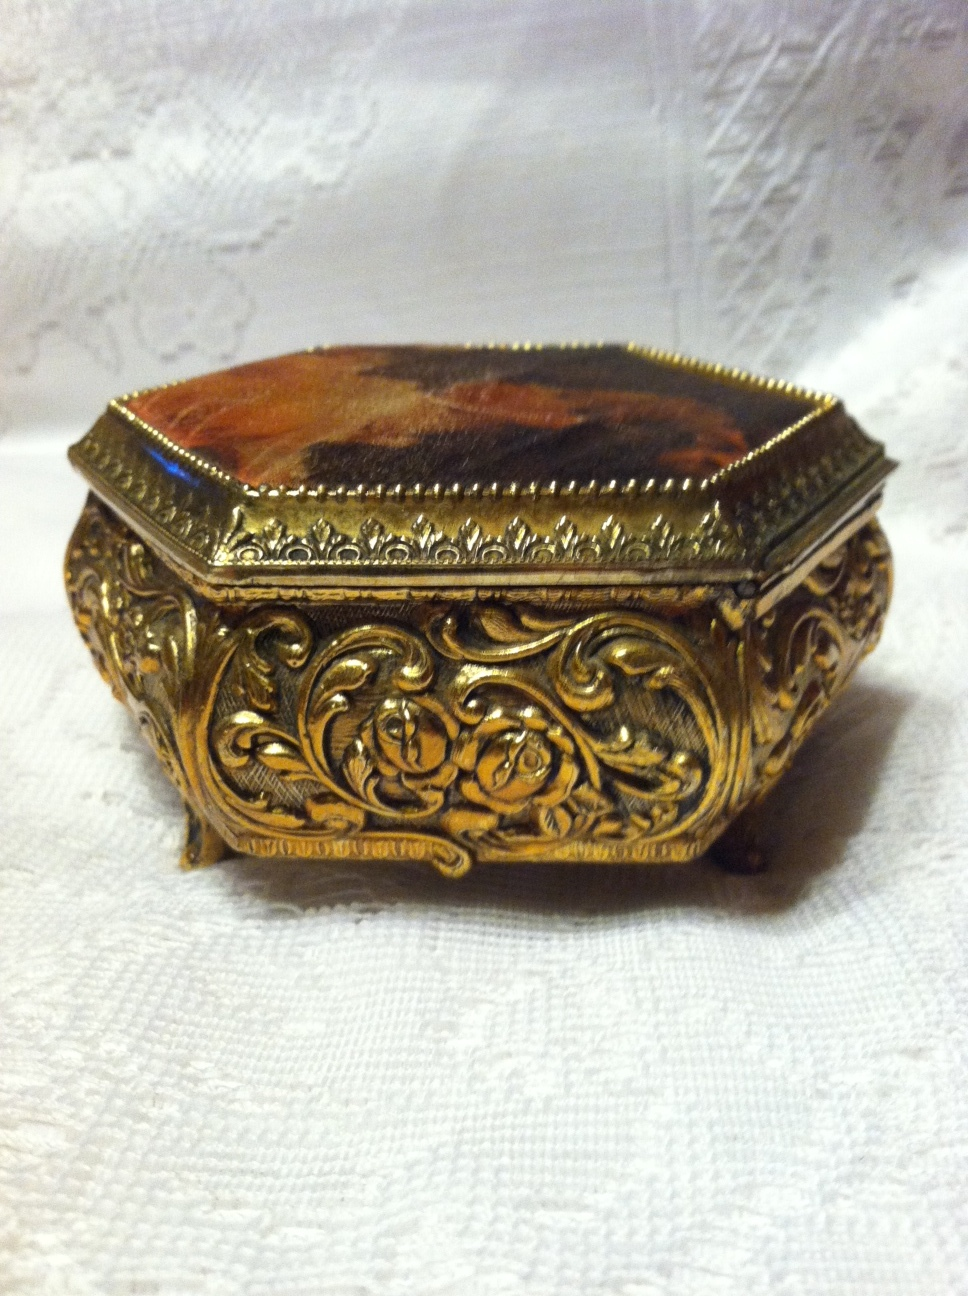 vintage sankyo music box ornate ornate gilt style cloth